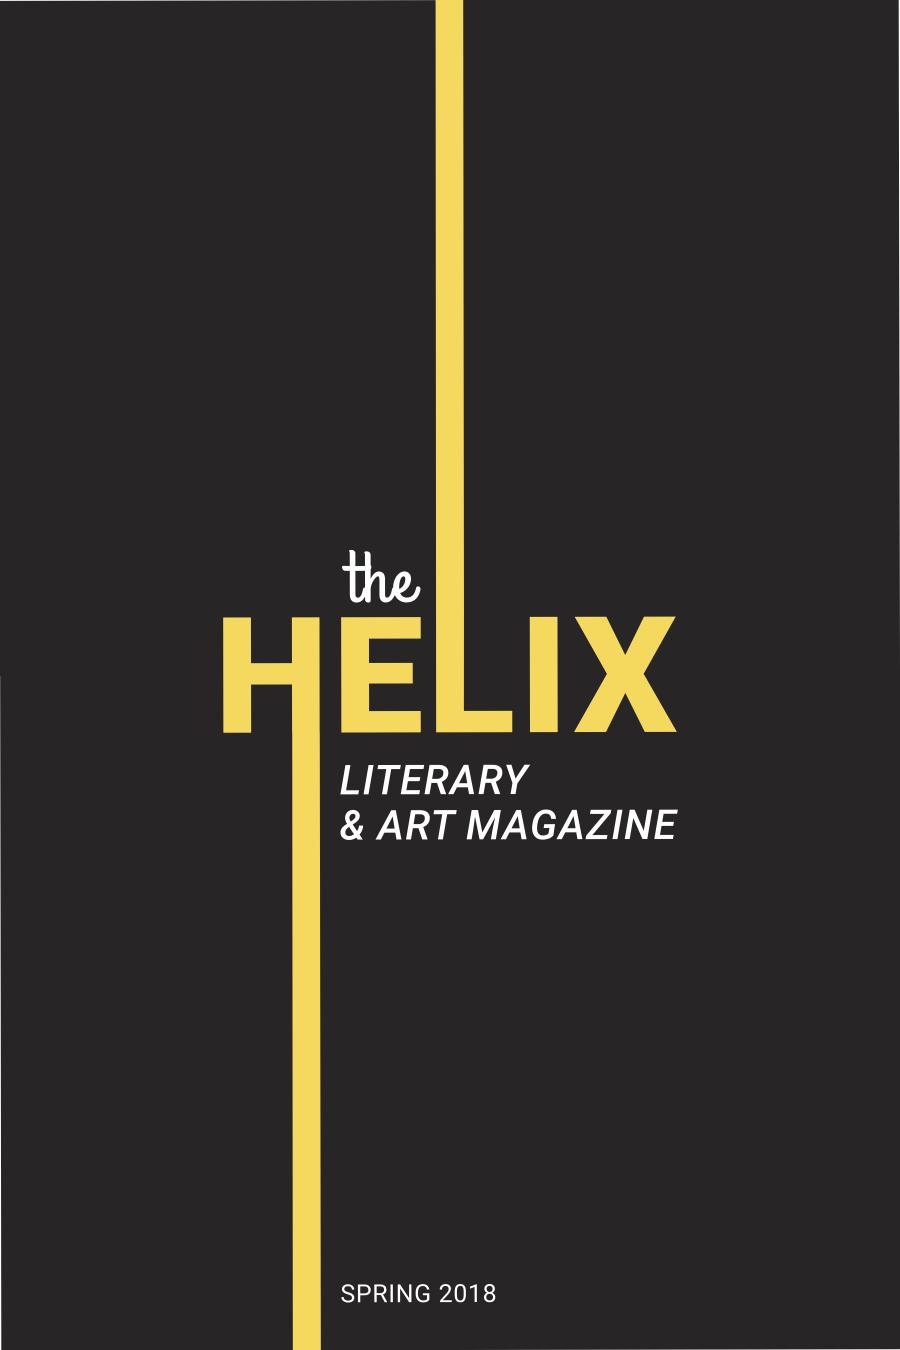 The Helix – Literary and Art Magazine